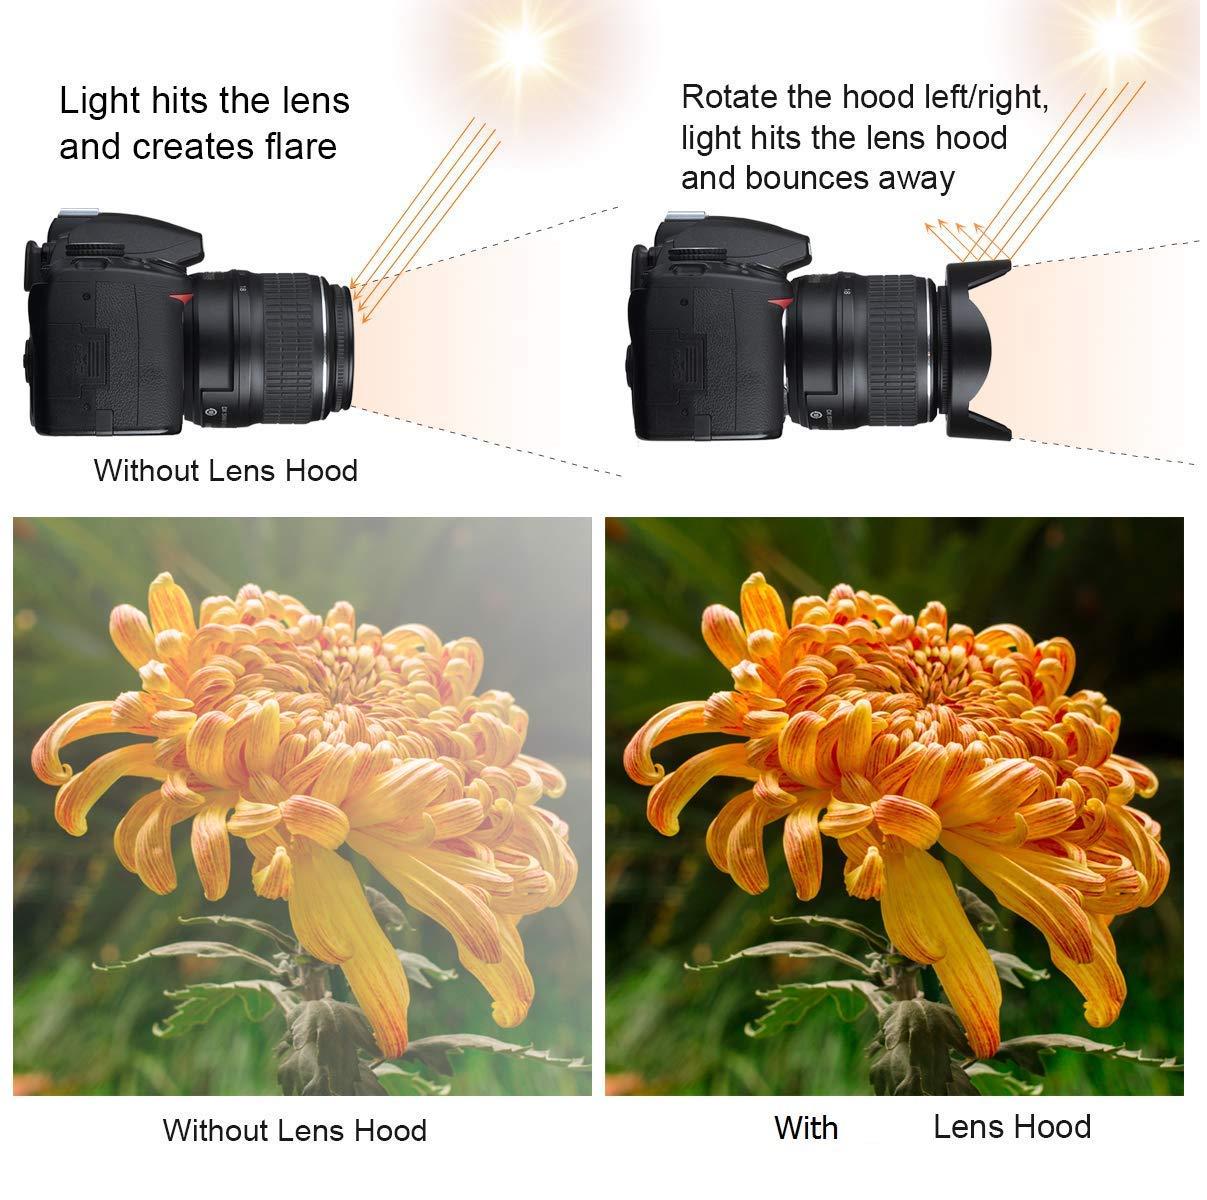 D5600 55mm and 58mm Tulip Lens Hood and UV Protective Filter Set for Nikon D3500 D3400 DSLR Camera with Nikon 18-55mm f//3.5-5.6G VR AF-P DX and Nikon 70-300mm f//4.5-6.3G ED